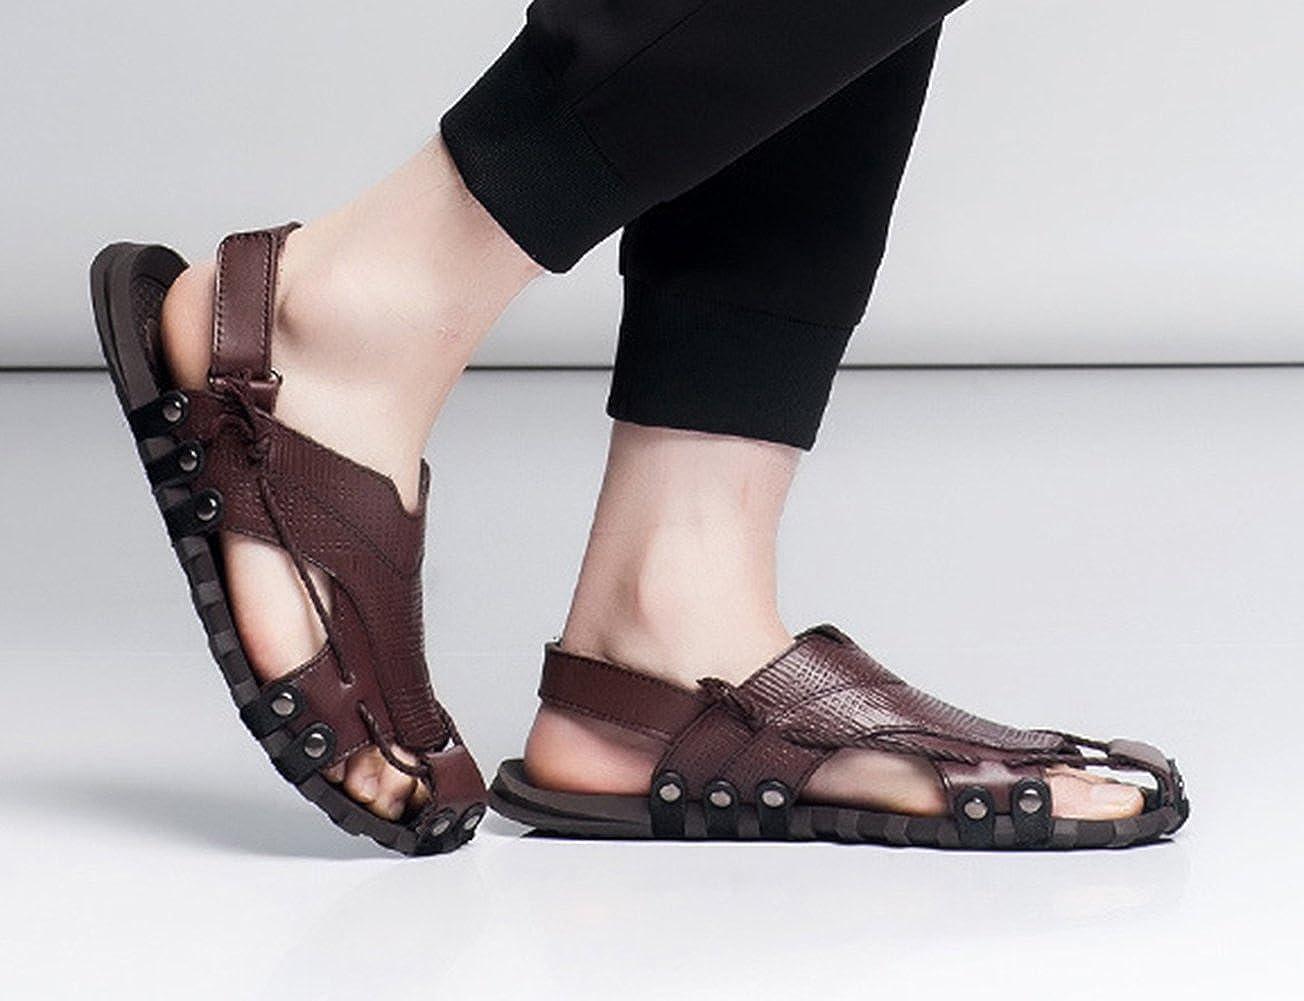 ICEGREY Herren Klettverschluss Leder KnöChelriemchen Sandalen mit Klettverschluss Herren Strand Hausschuhe Braun 178c9b